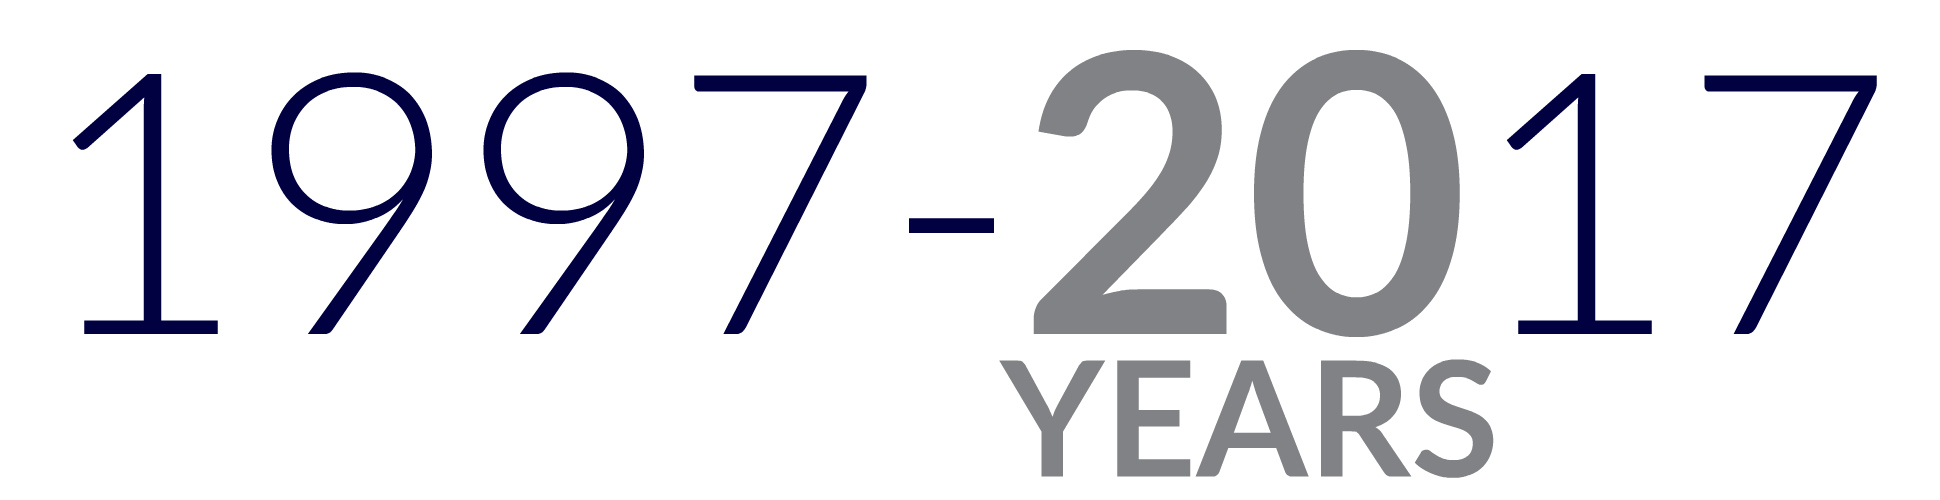 20 years rectangle.jpg